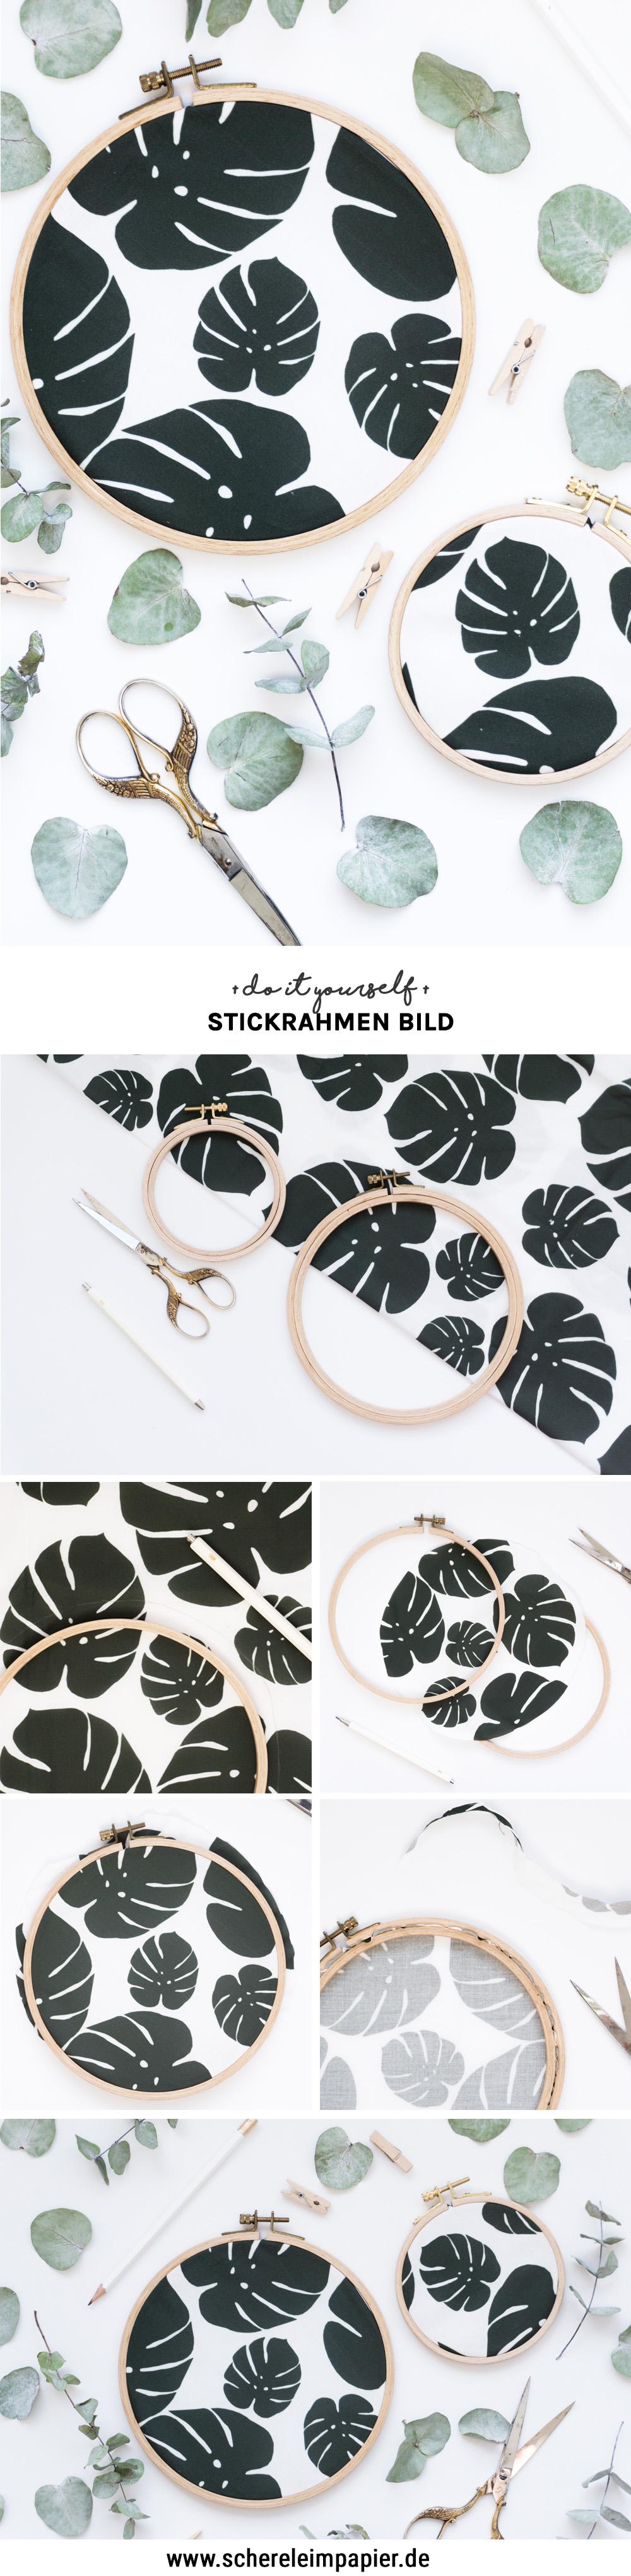 diy stoff bedrucken schereleimpapier dy blog upcyling stickrahmen idee kreativ pin. Black Bedroom Furniture Sets. Home Design Ideas